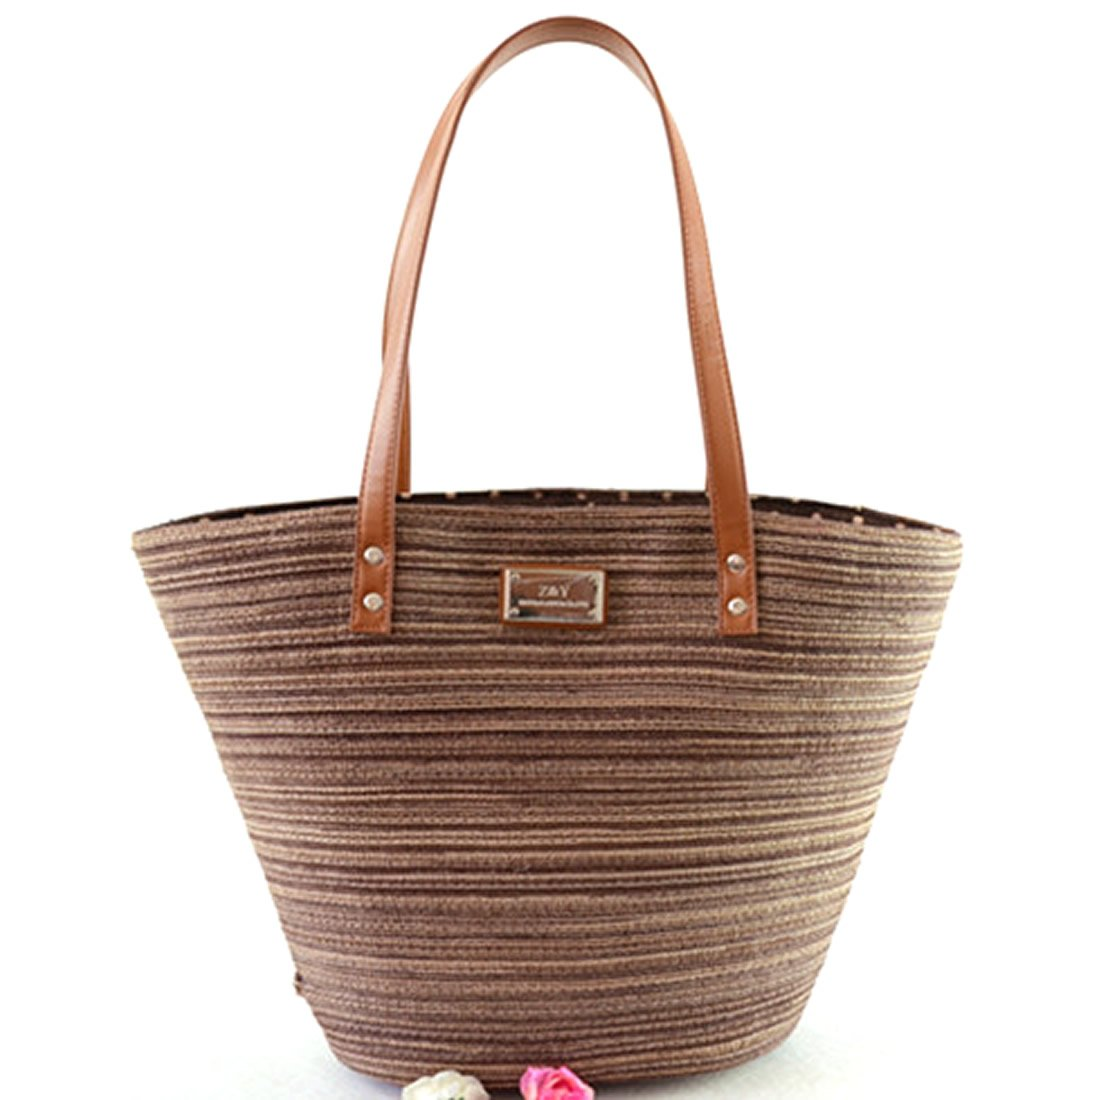 Women's Straw Large Hobo Bag Summer Beach Crochet Shoulder Tote Bags (Brown)